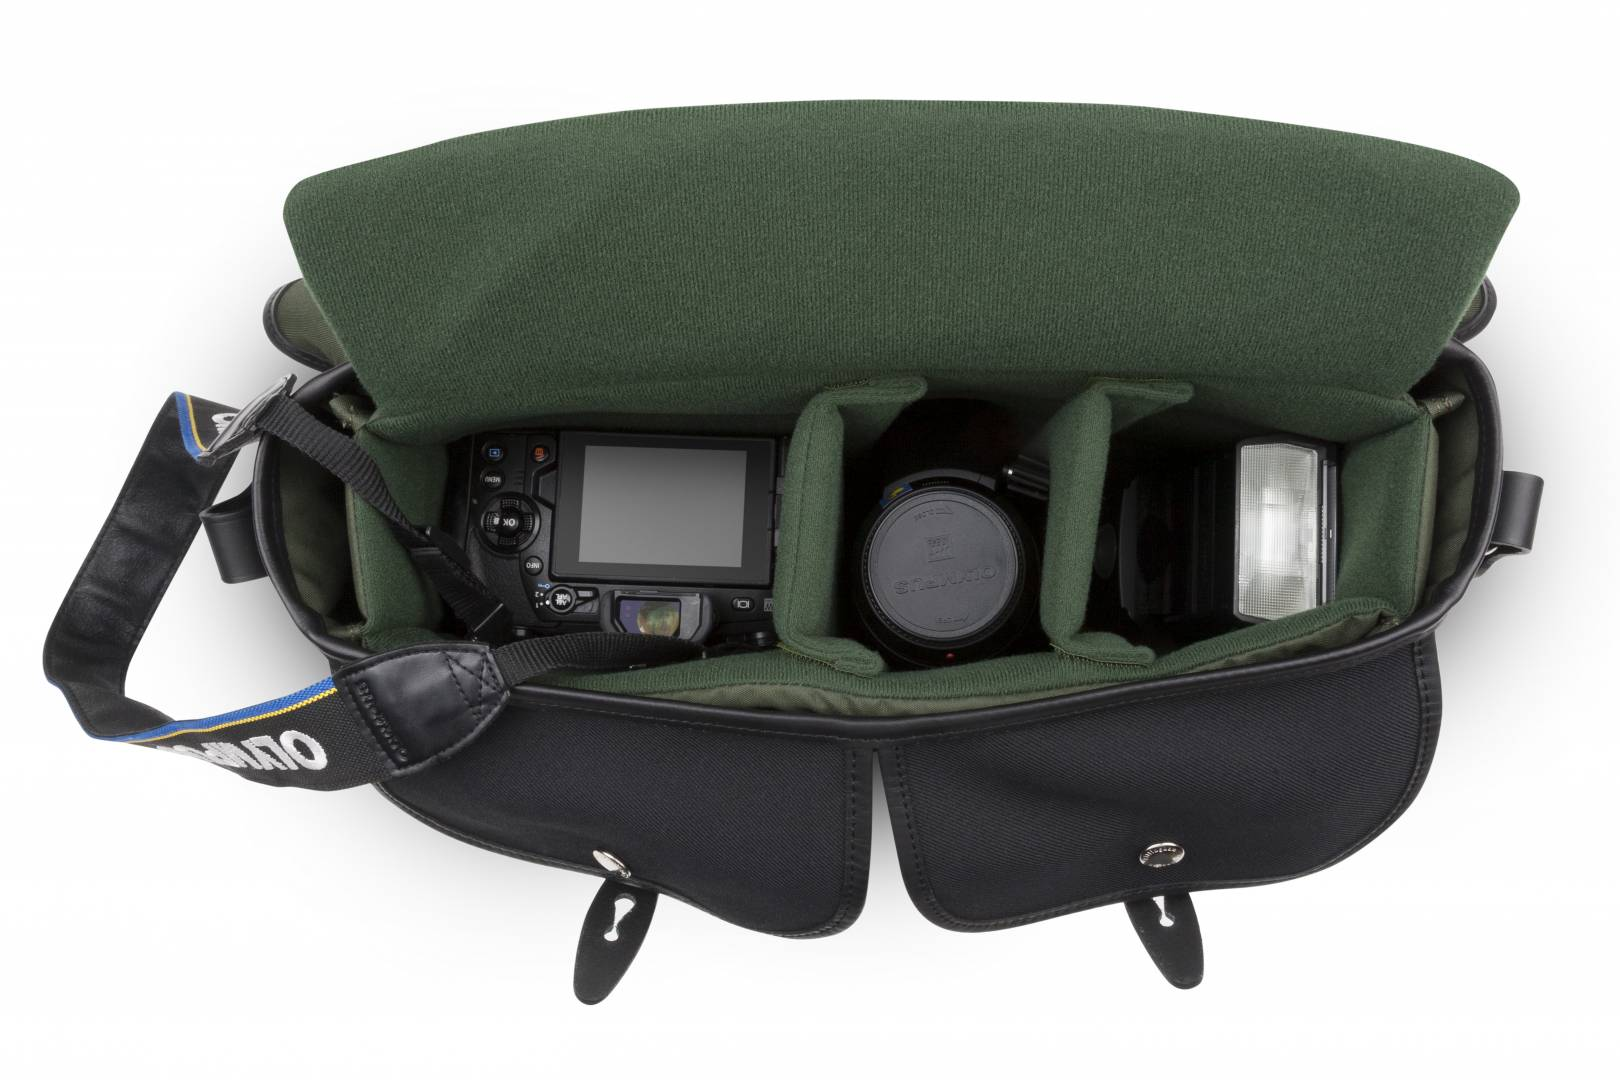 Best Camera Bags 2020 Billingham launches new Hadley Pro 2020 system bag   Macfilos